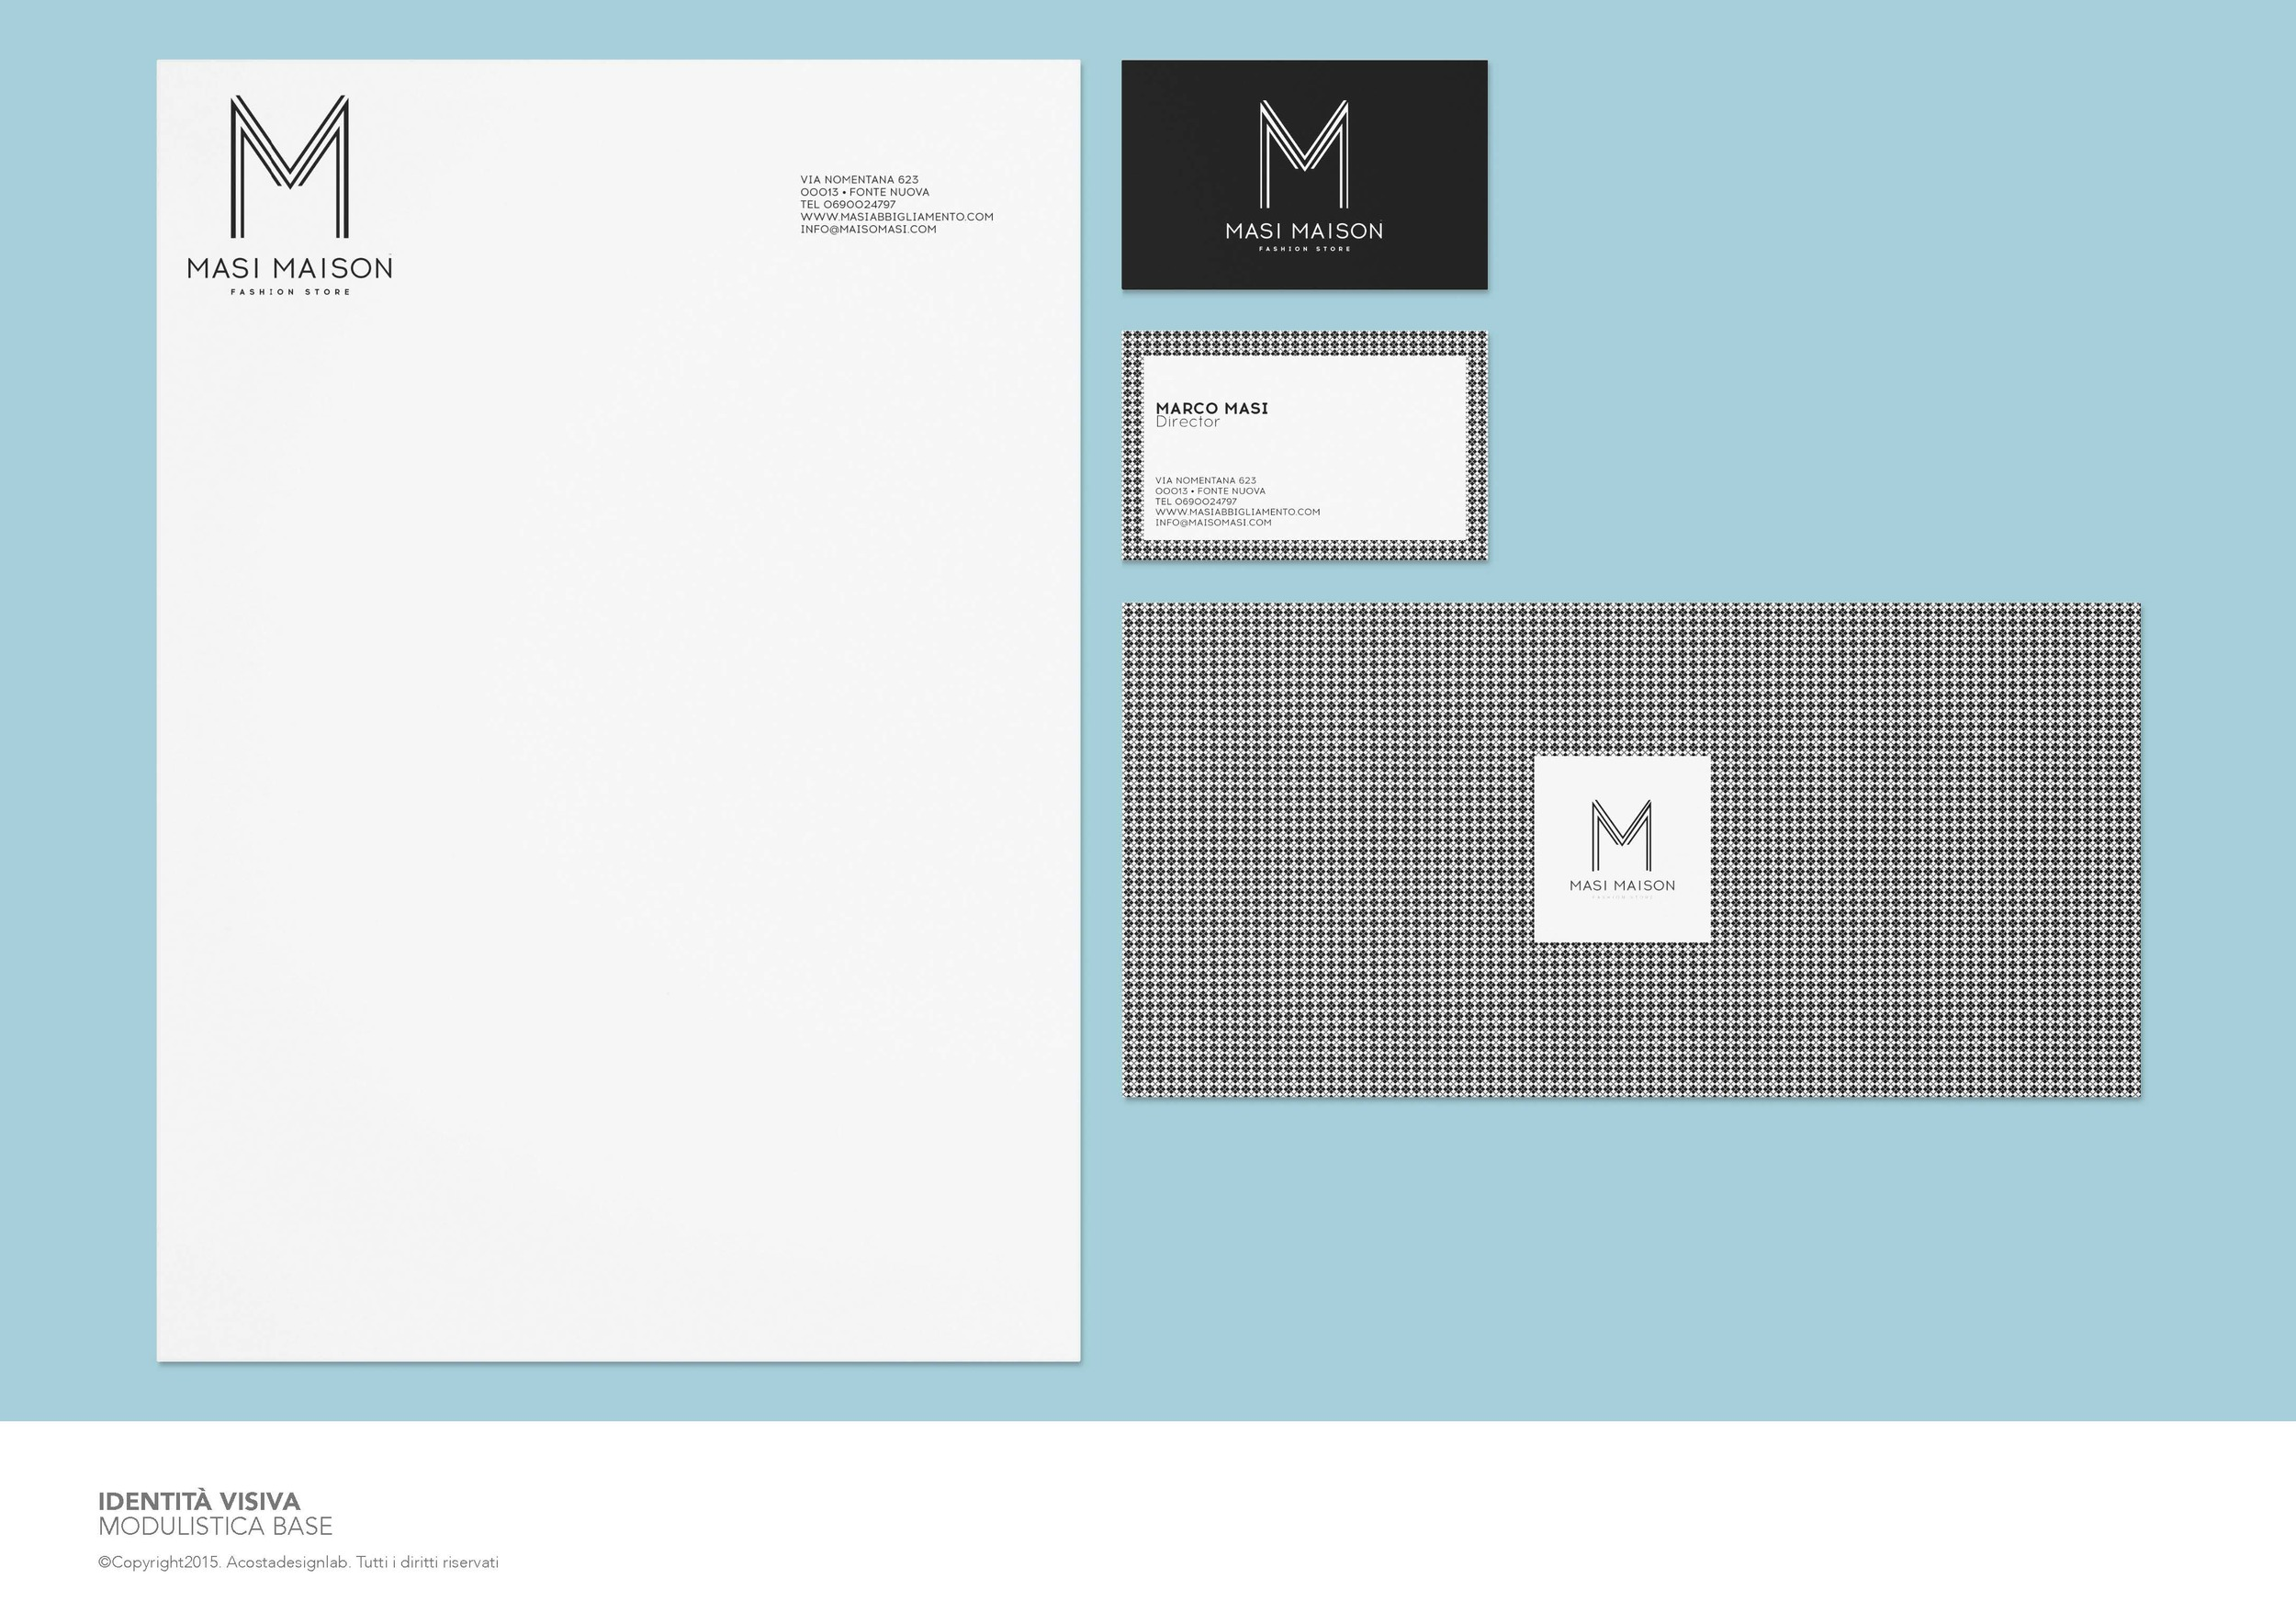 masi documento master_Pagina_31.jpg